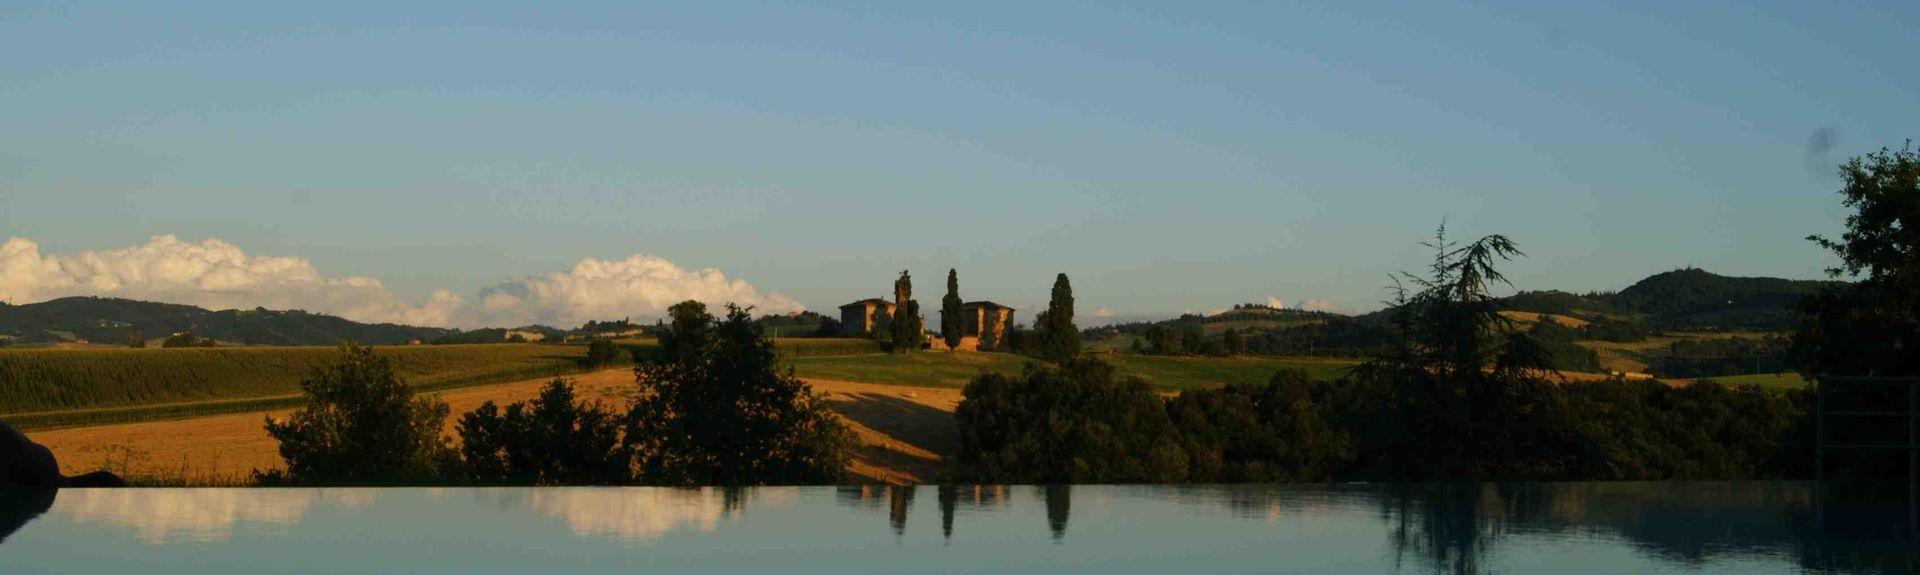 Modena, Emilia-Romagna, Italy